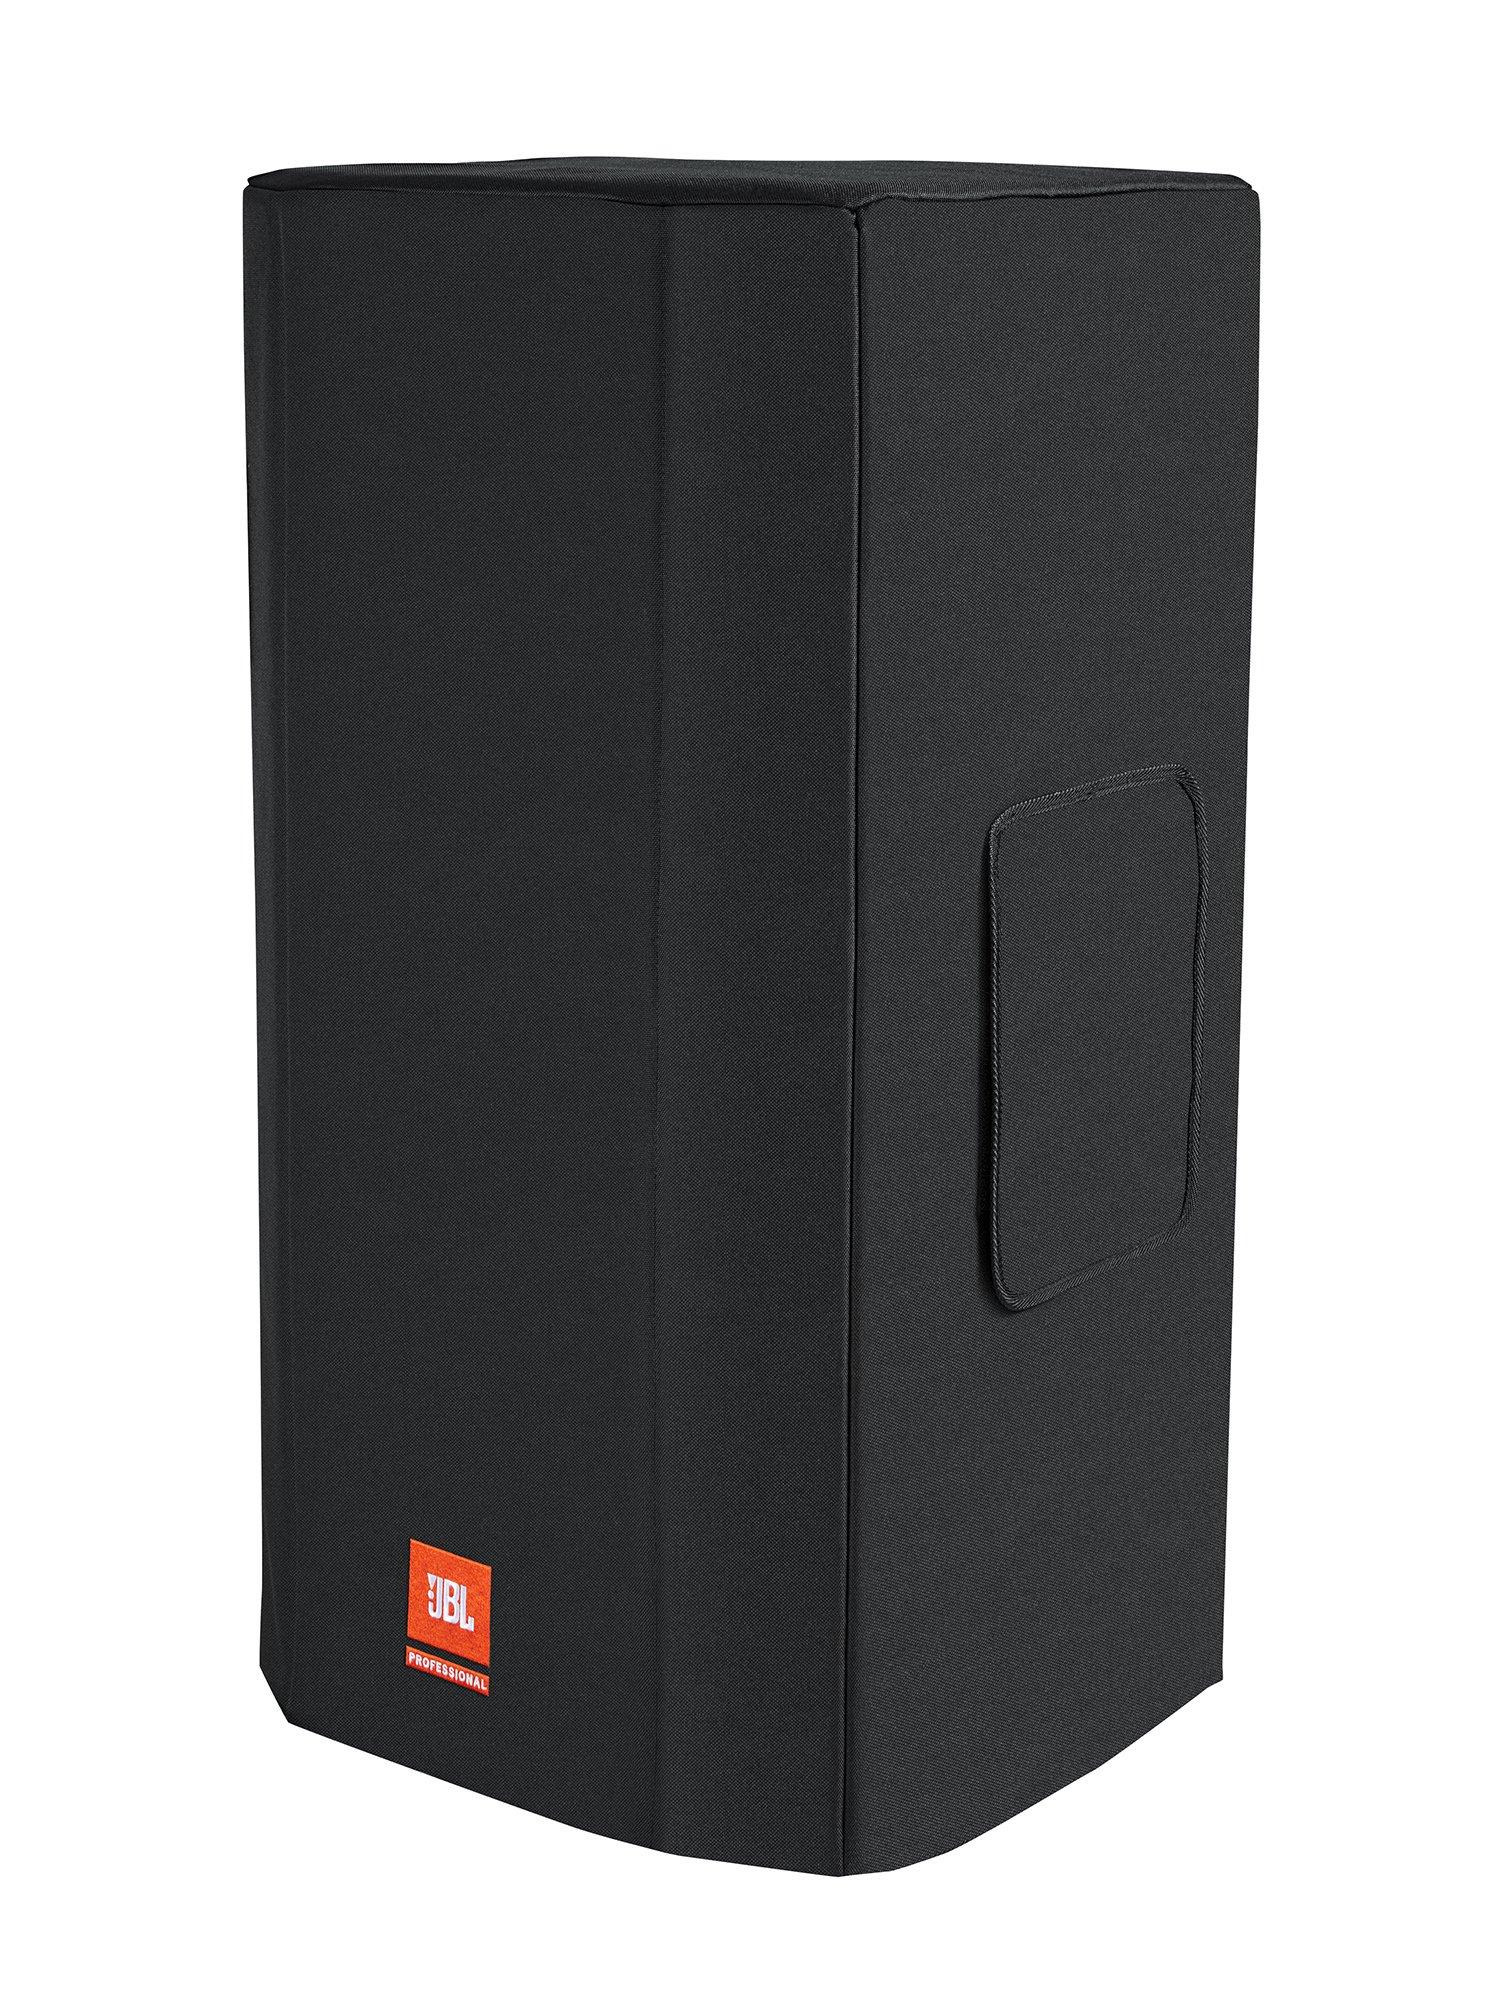 JBL Bags SRX835P-CVR-DLX Deluxe Padded Protective Cover for SRX835P-CVR